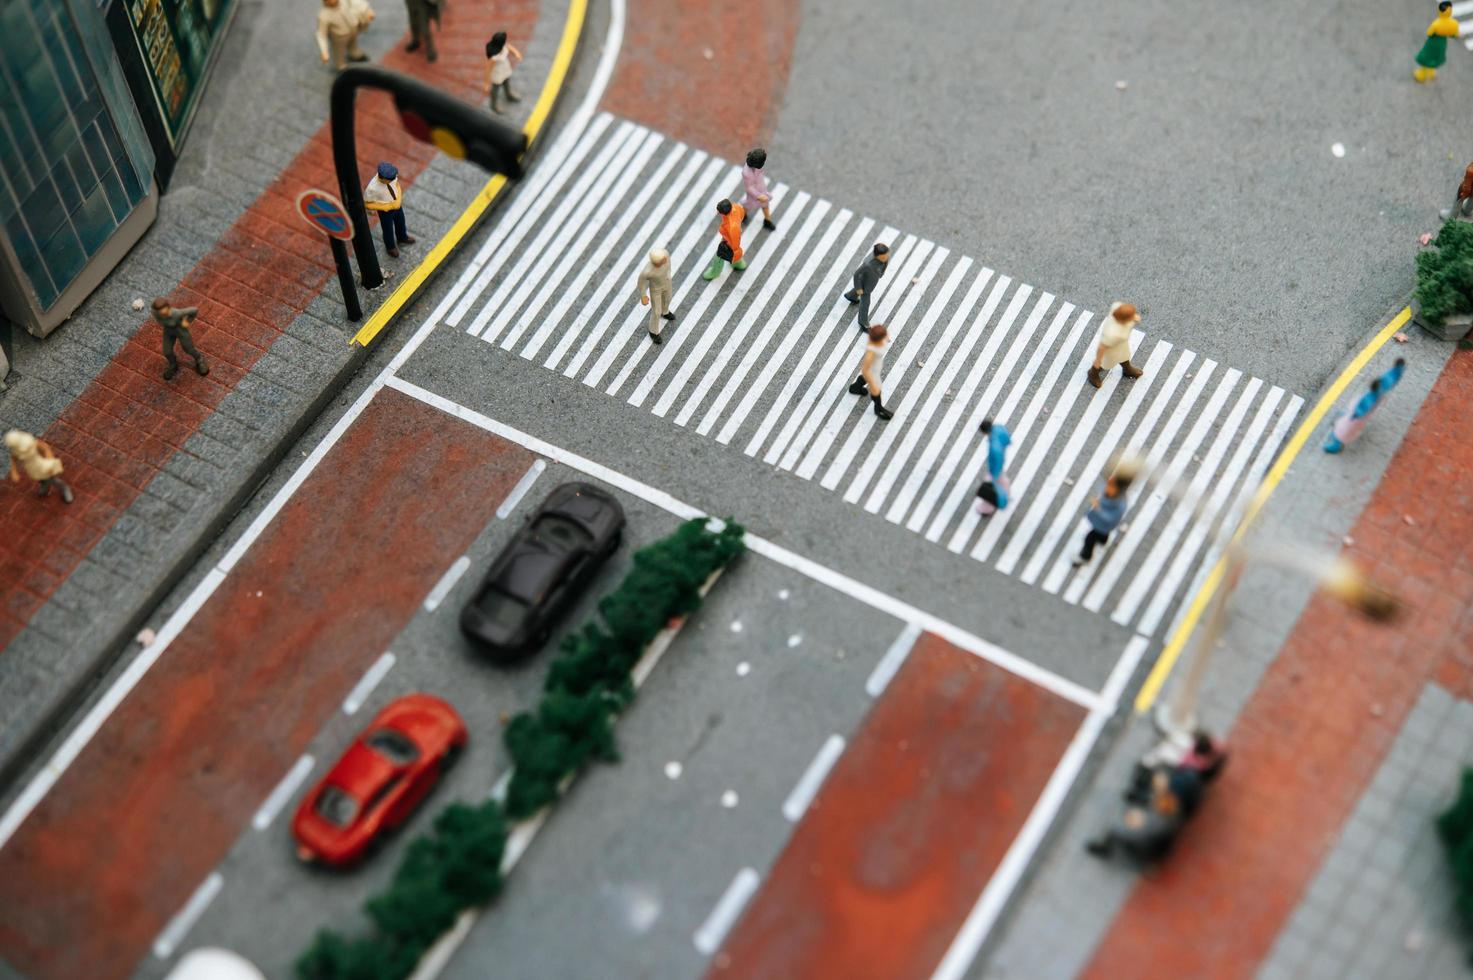 miniatuur tilt shift straatmensen foto